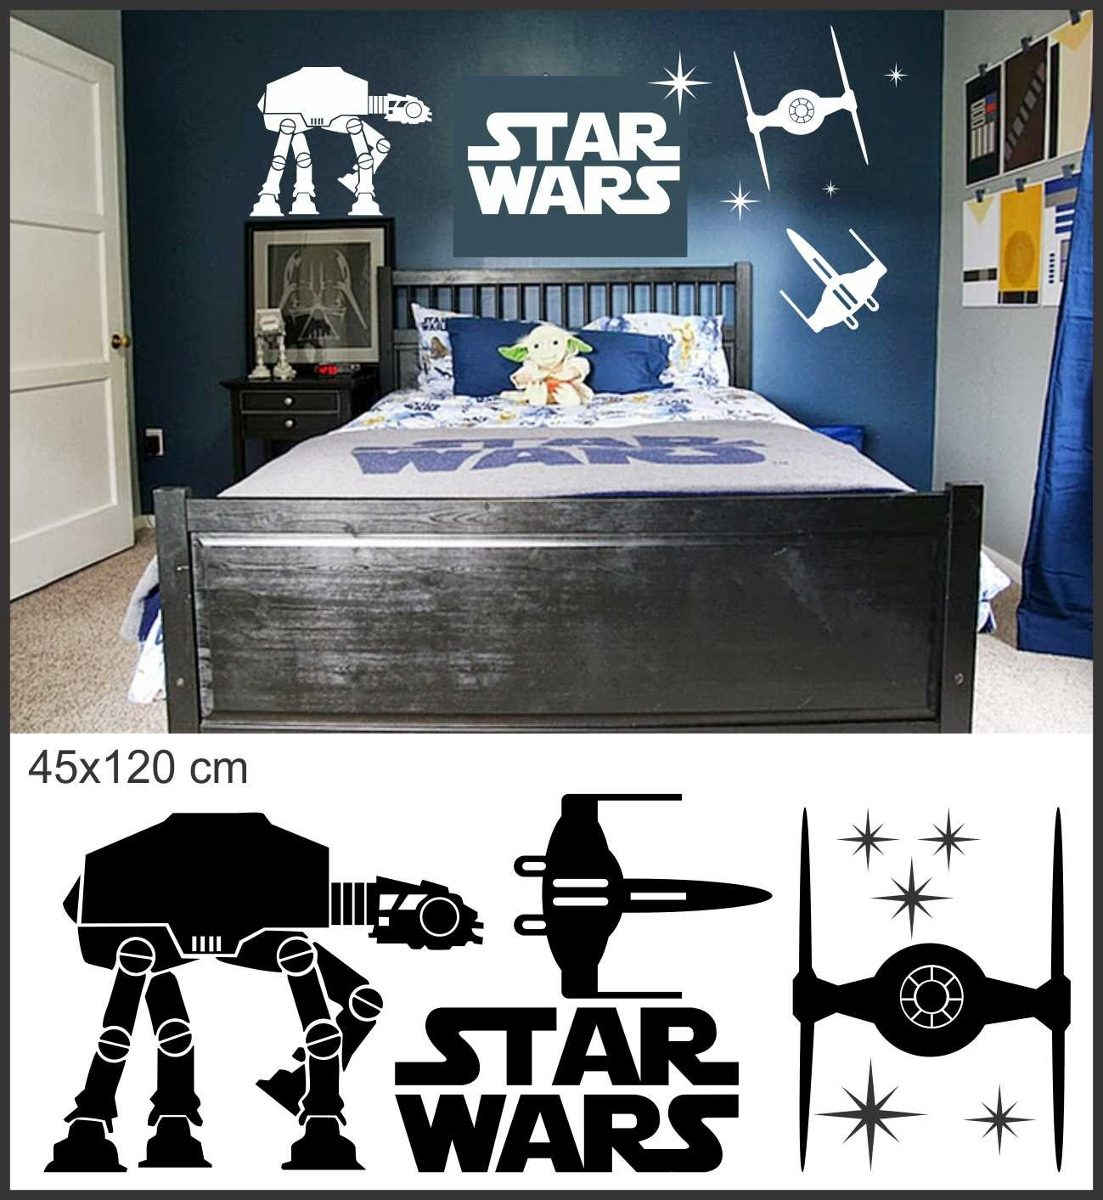 Adesivo Parede Dente De Leão ~ Adesivo De Parede Star Wars Dartwader Jedy Guerra R$ 79,90 no MercadoLivre